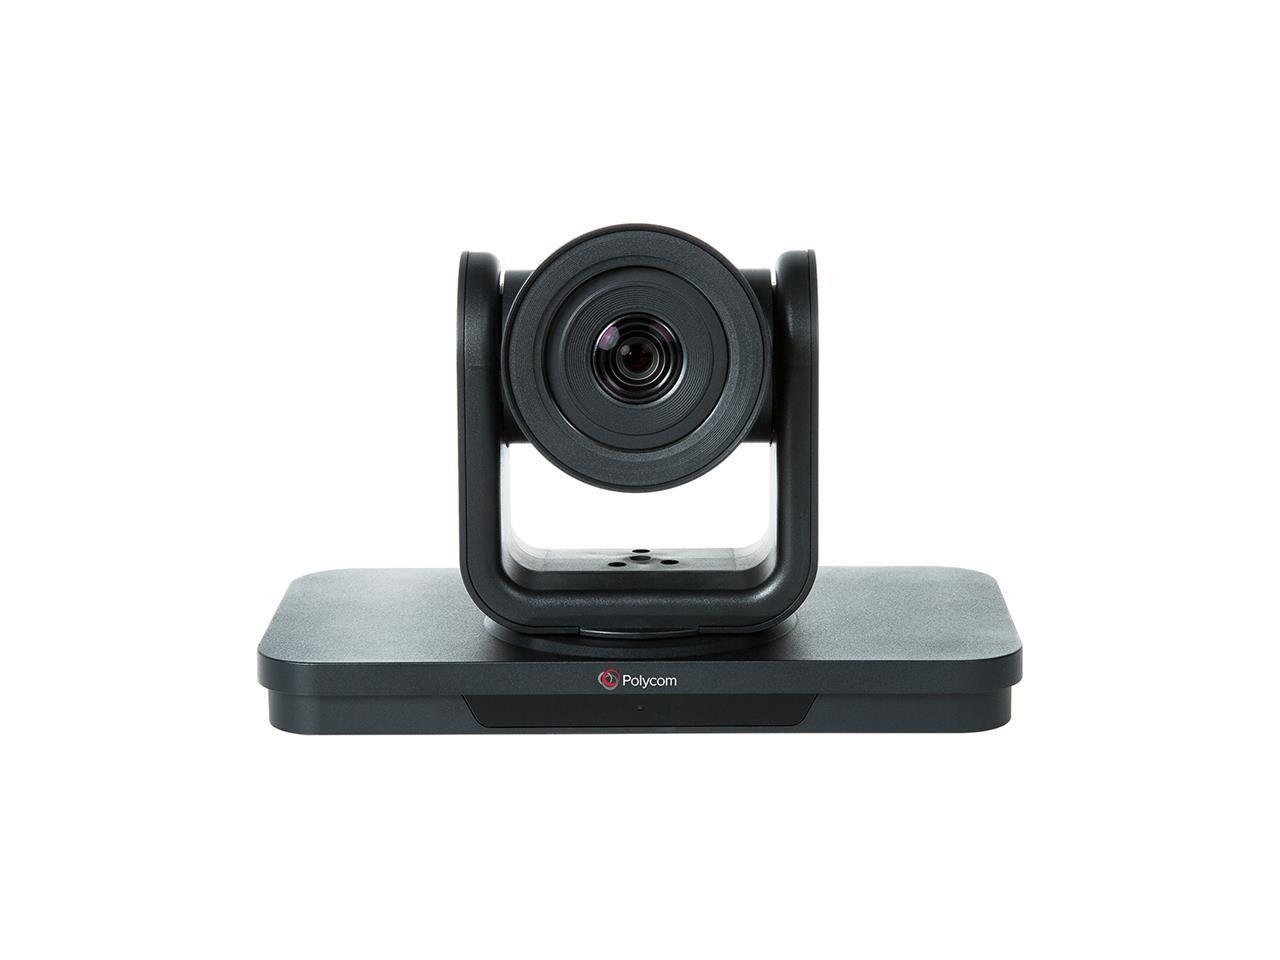 Polycom Eagleeye Iv MPTZ-11 4x Video Conferencing Camera 8200-64370-001